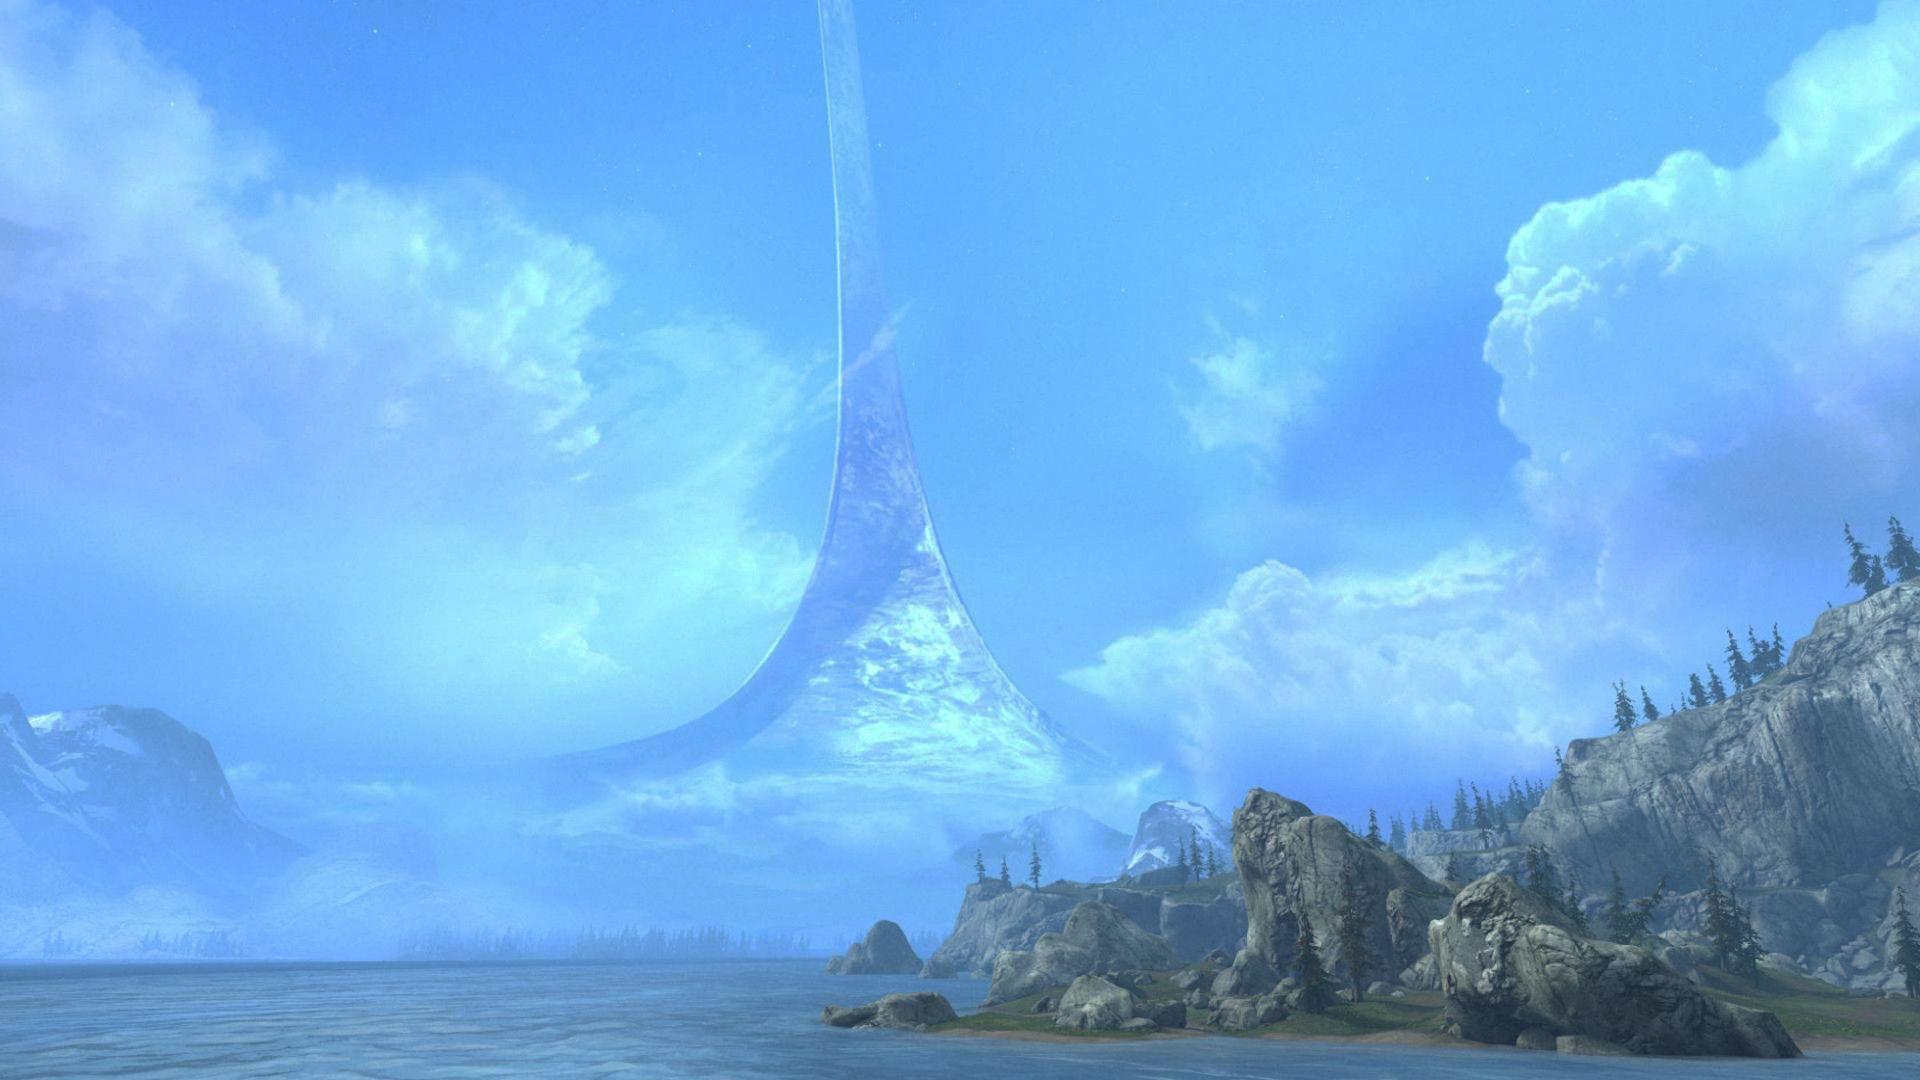 Ring World Halo Wallpaper 1920x1080 1920x1080 Beautiful Landscapes Fantasy Landscape Sci Fi Wallpaper